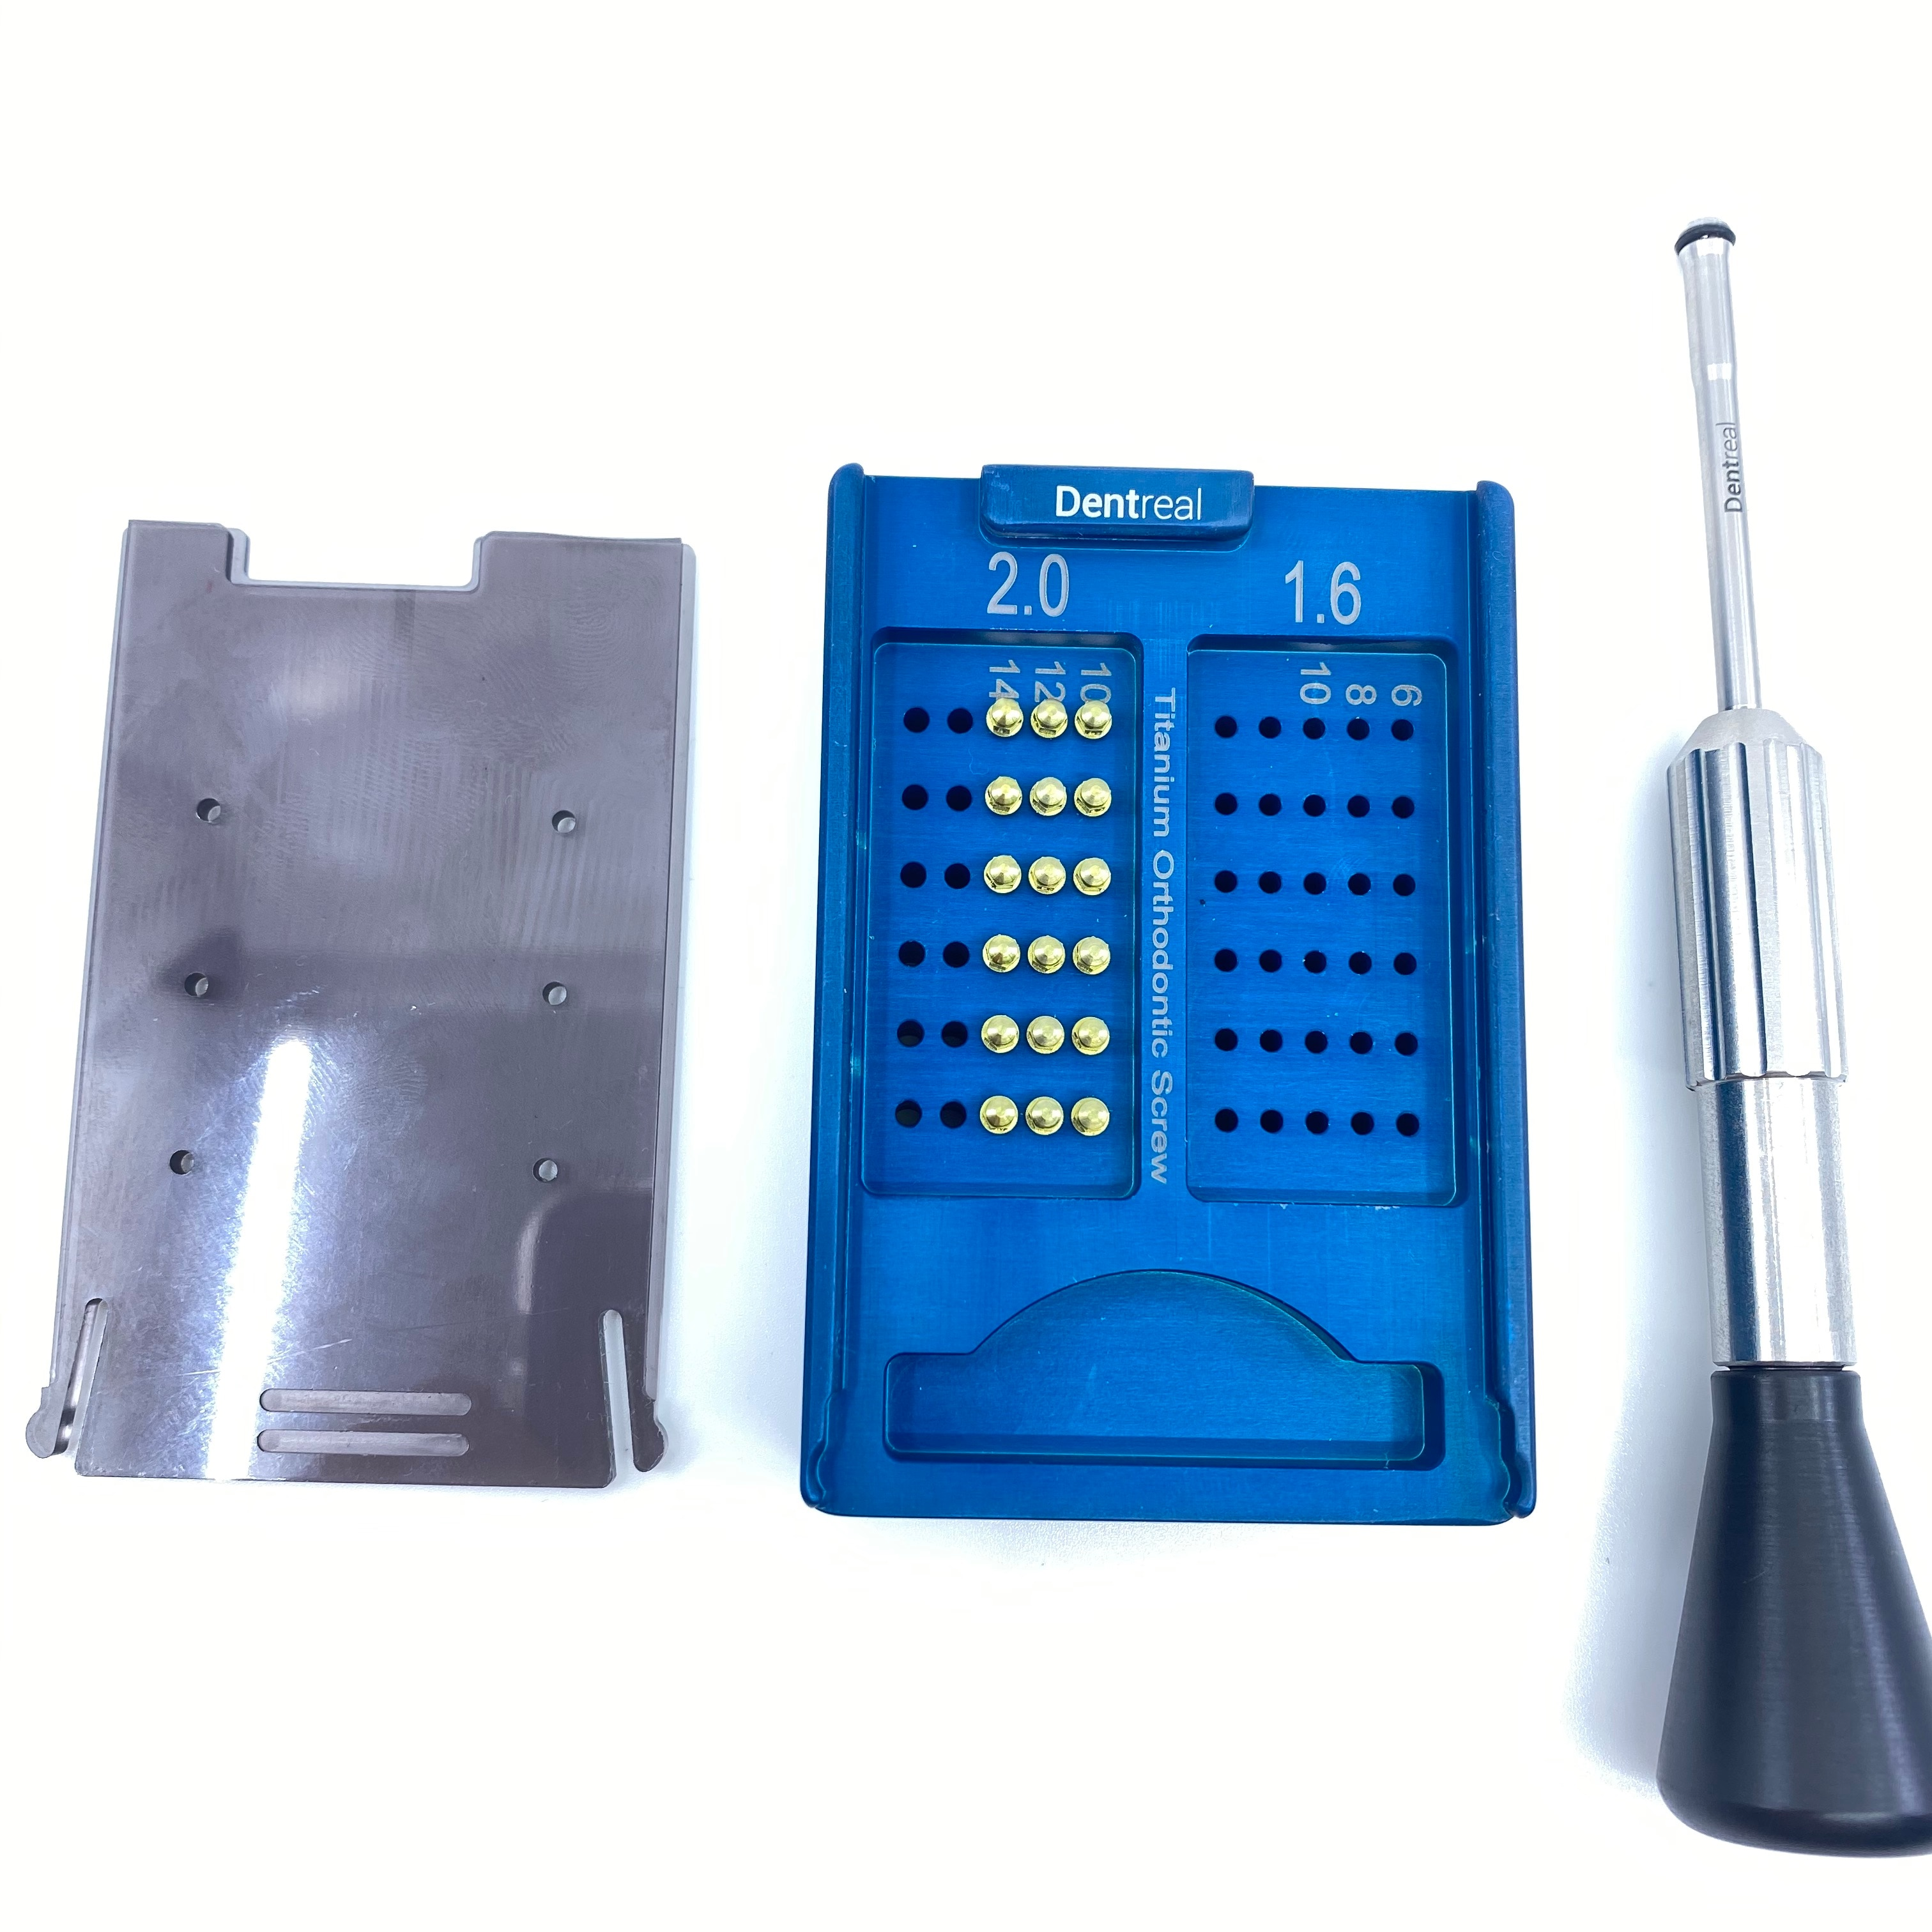 Orthofix Orthodontic Mini Screw Kit (2,0 mm Screw) Orthodontic mini implant